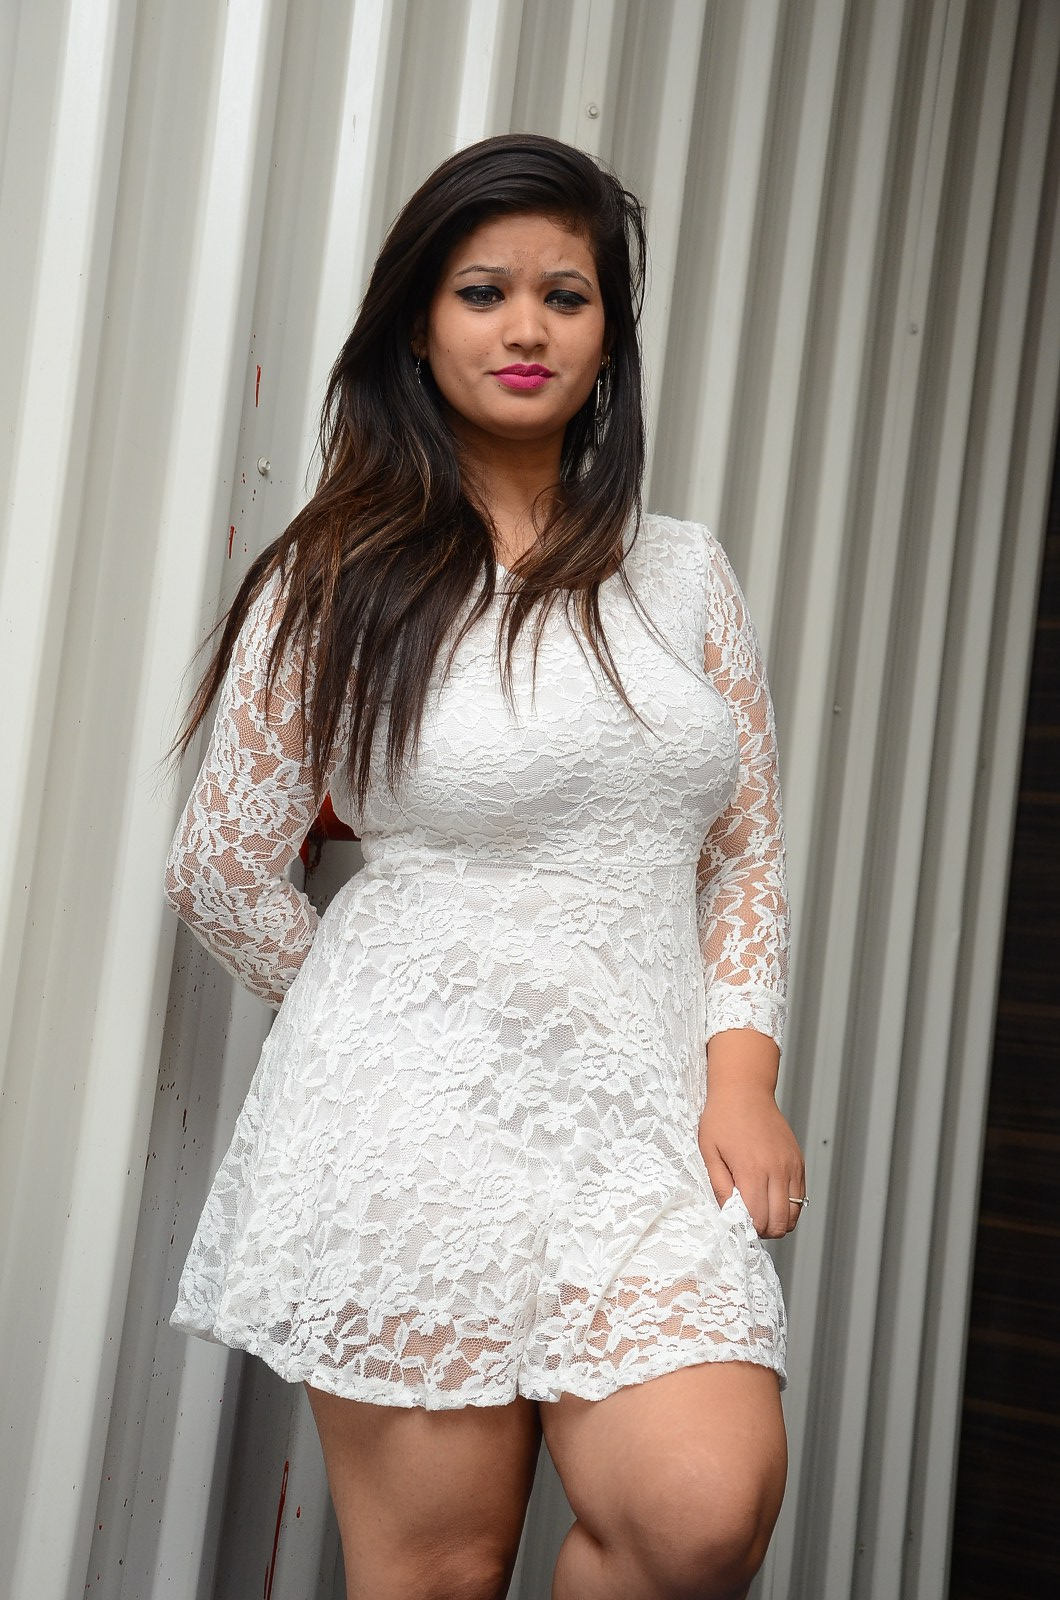 Himani photos at Jyothi Lakshmi Audio-HQ-Photo-29